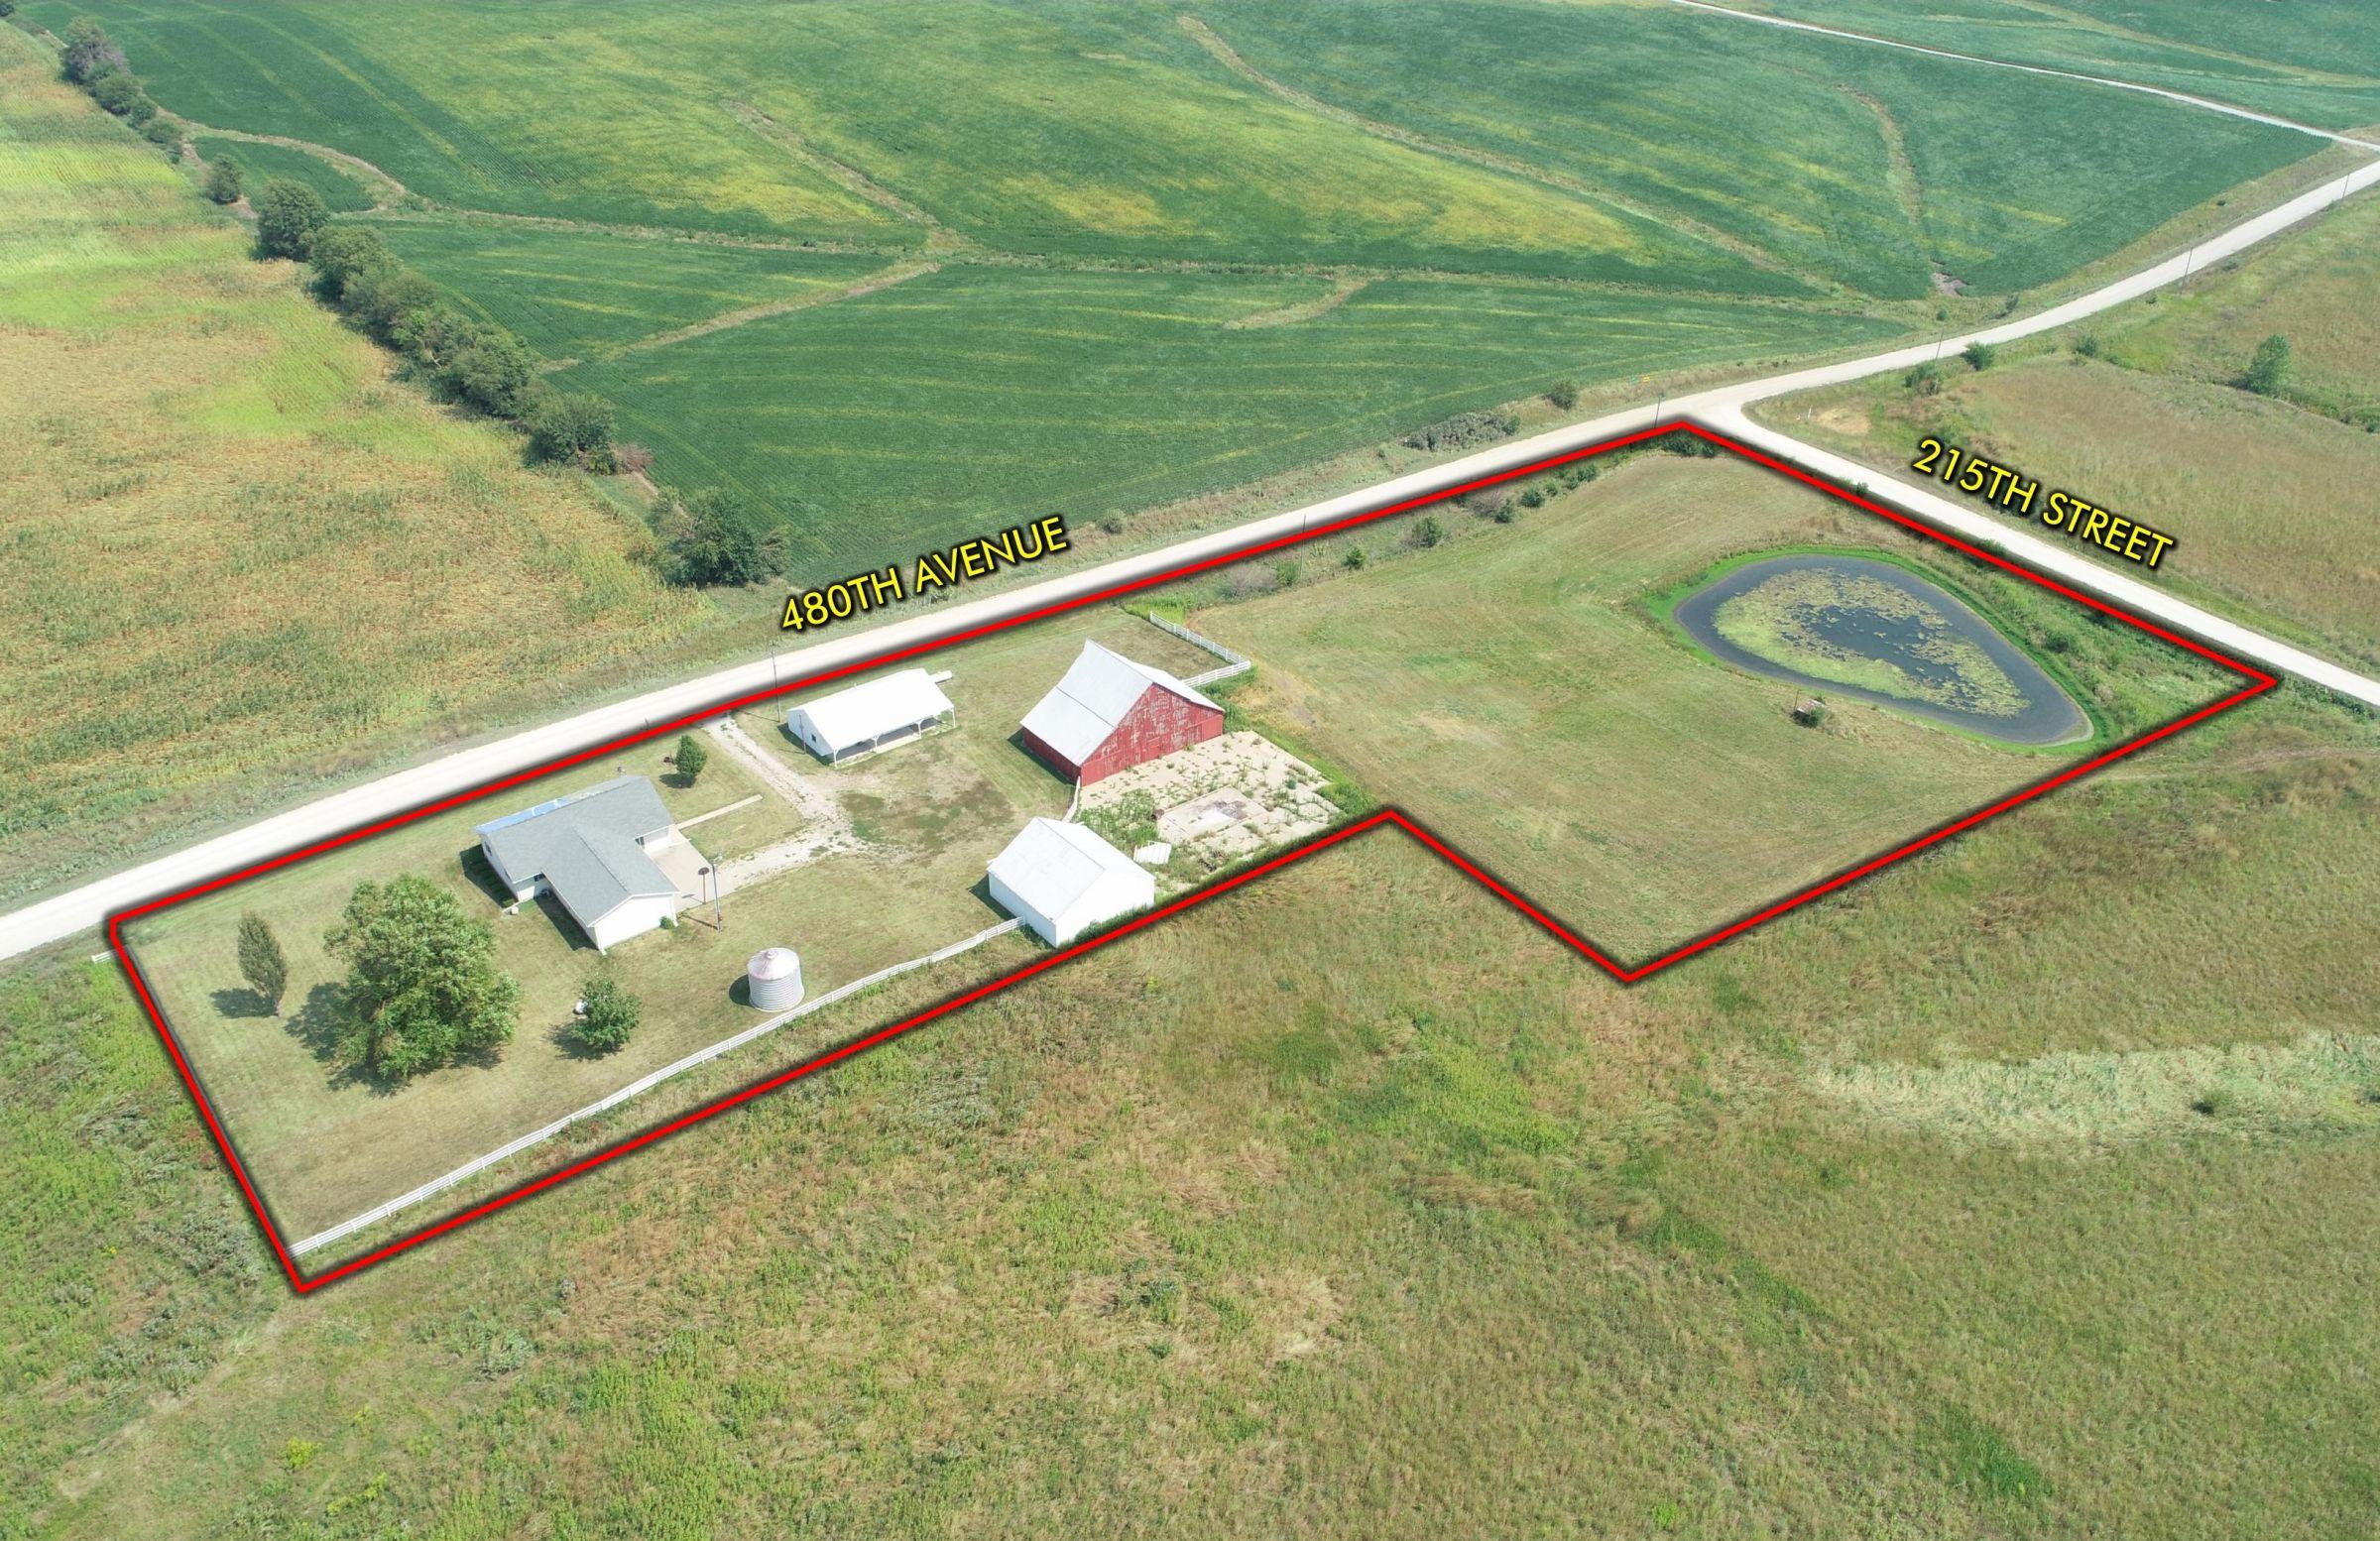 residential-land-poweshiek-county-iowa-5-acres-listing-number-15149-1-2020-08-28-195804.jpg